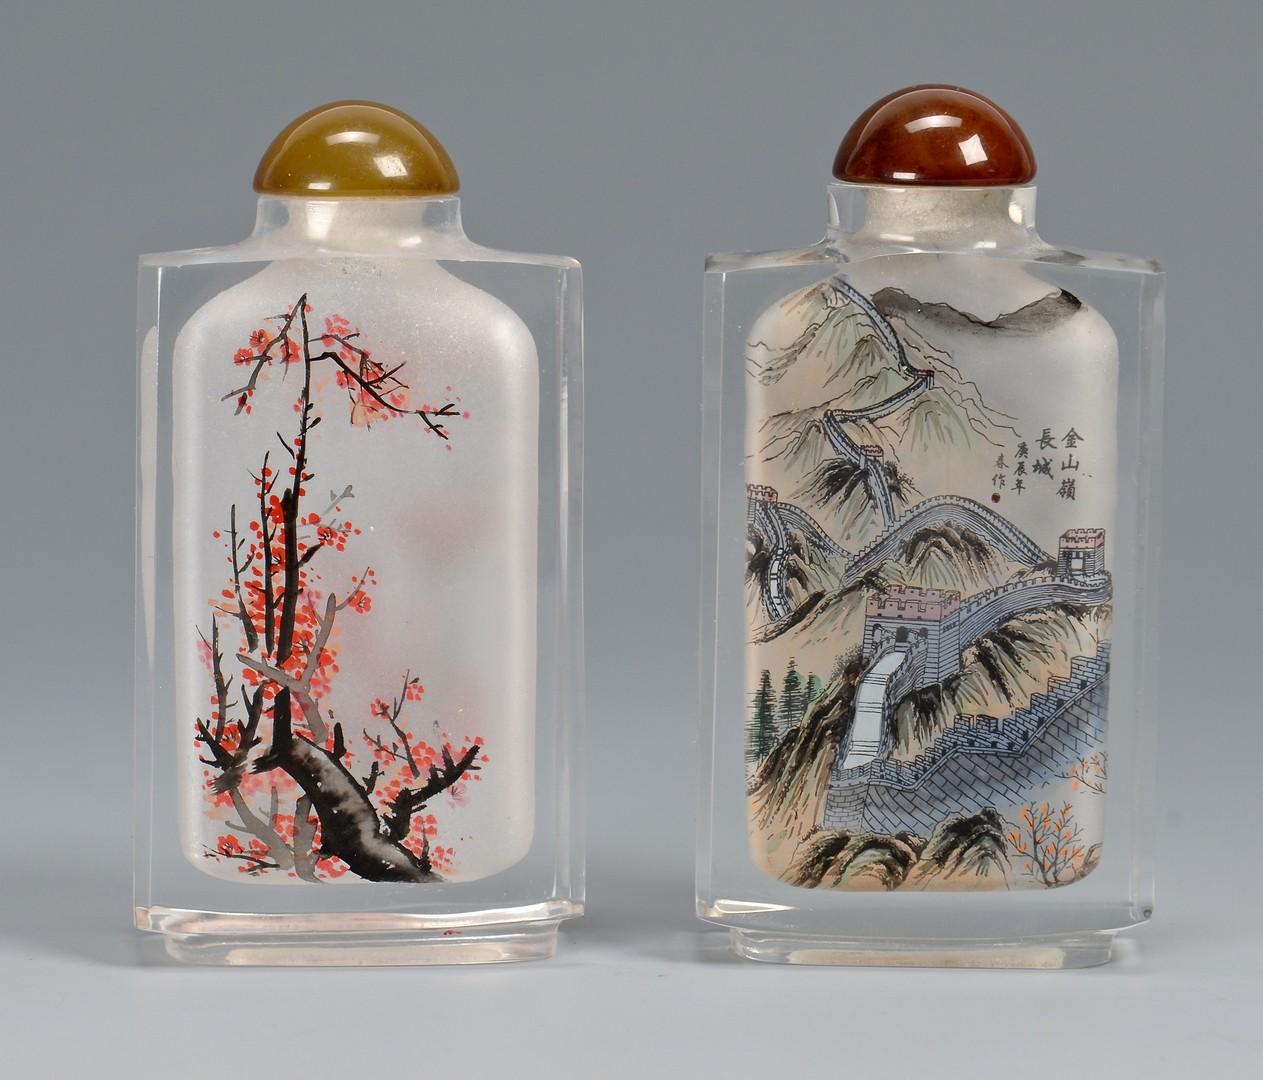 Lot 3832399: Pr. Chinese Mille Fleur Miniature Vases & Pr. Snuff Bottles